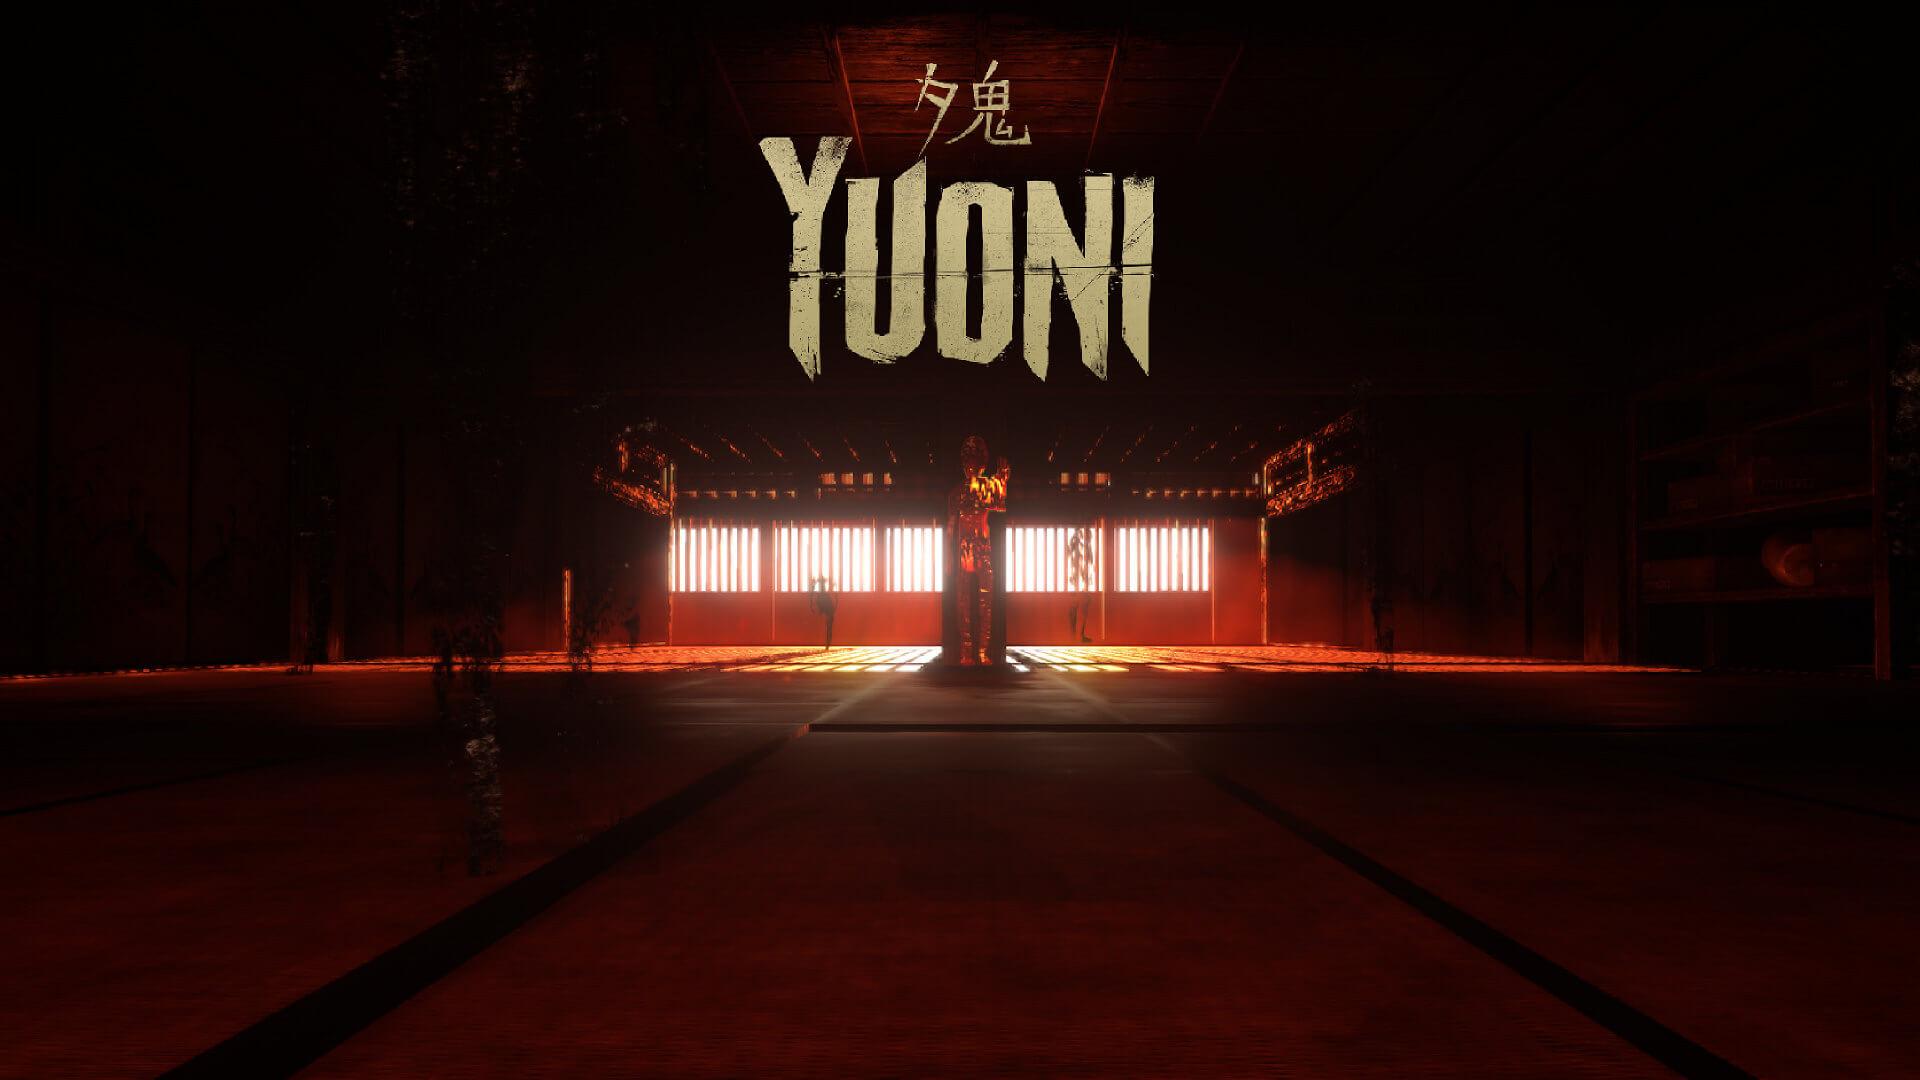 Yuoni Key Art